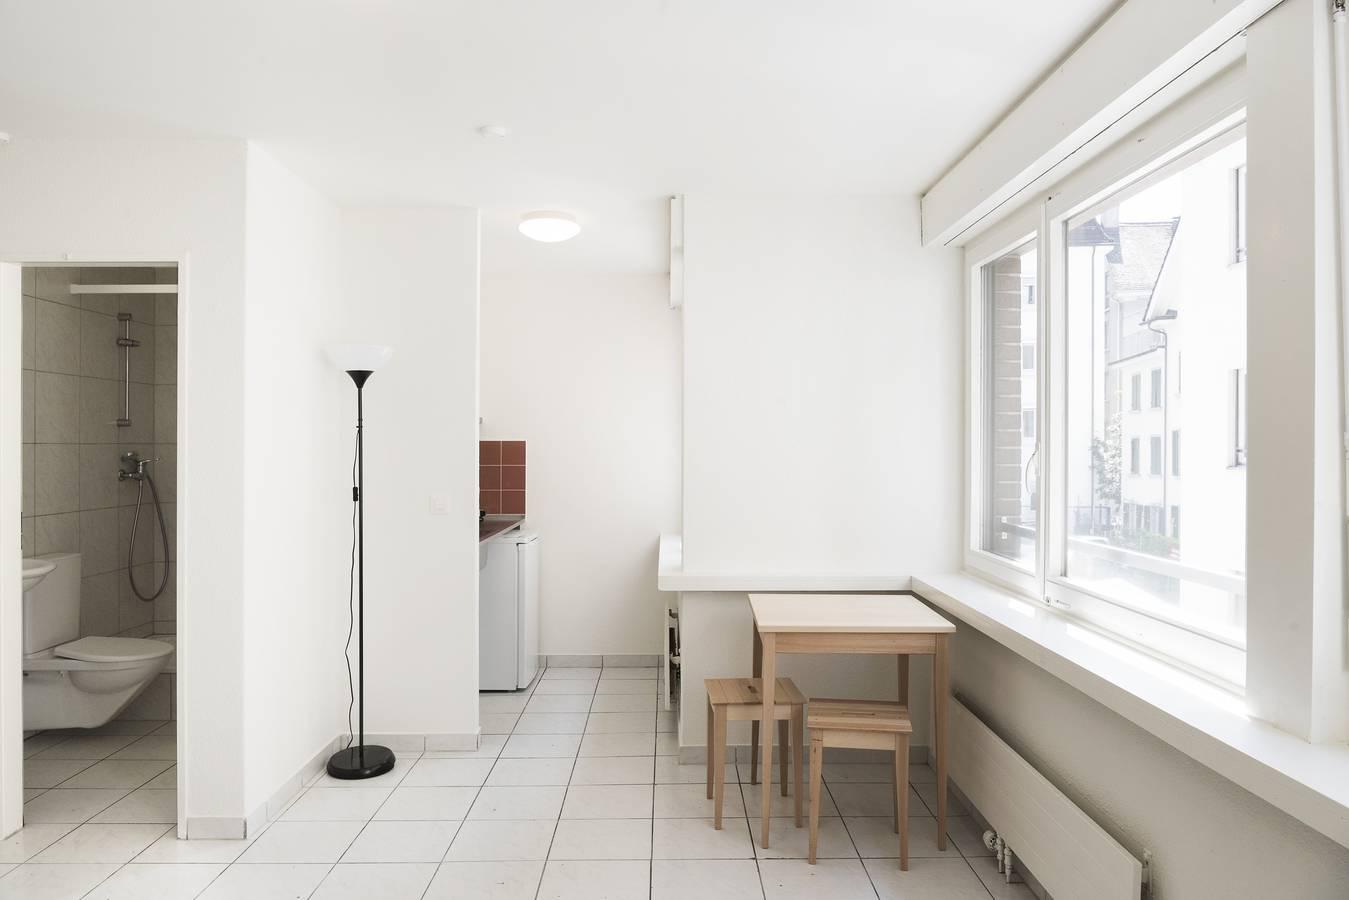 Gammelhäuser_nach_Renovation_2019